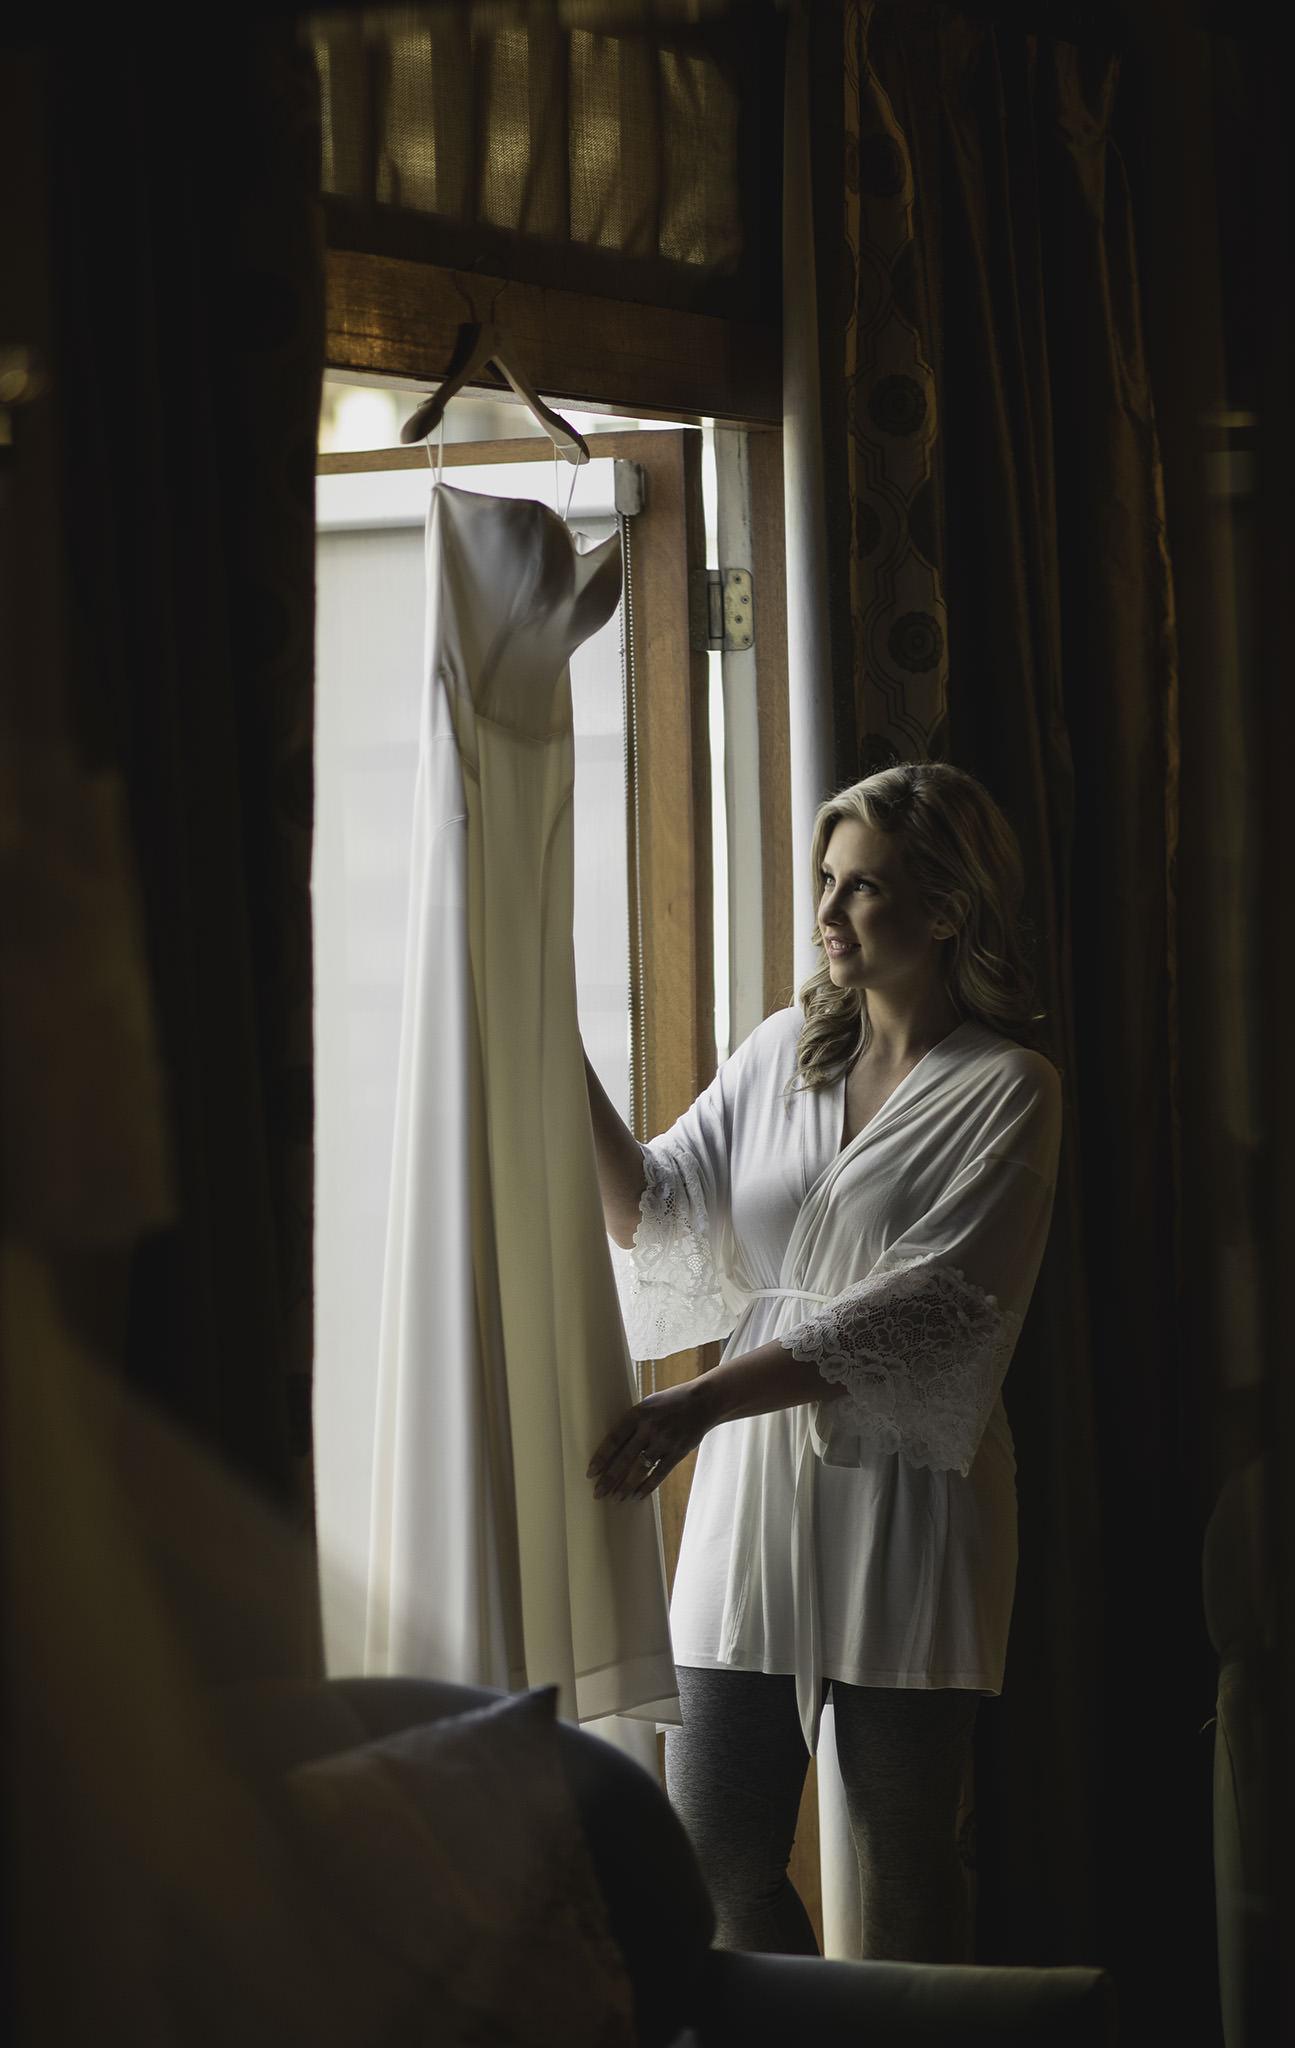 Claire-Travis-Classy-artistic-Downtown-Houston-Rice-ballroom-wedding-sm-002.jpg